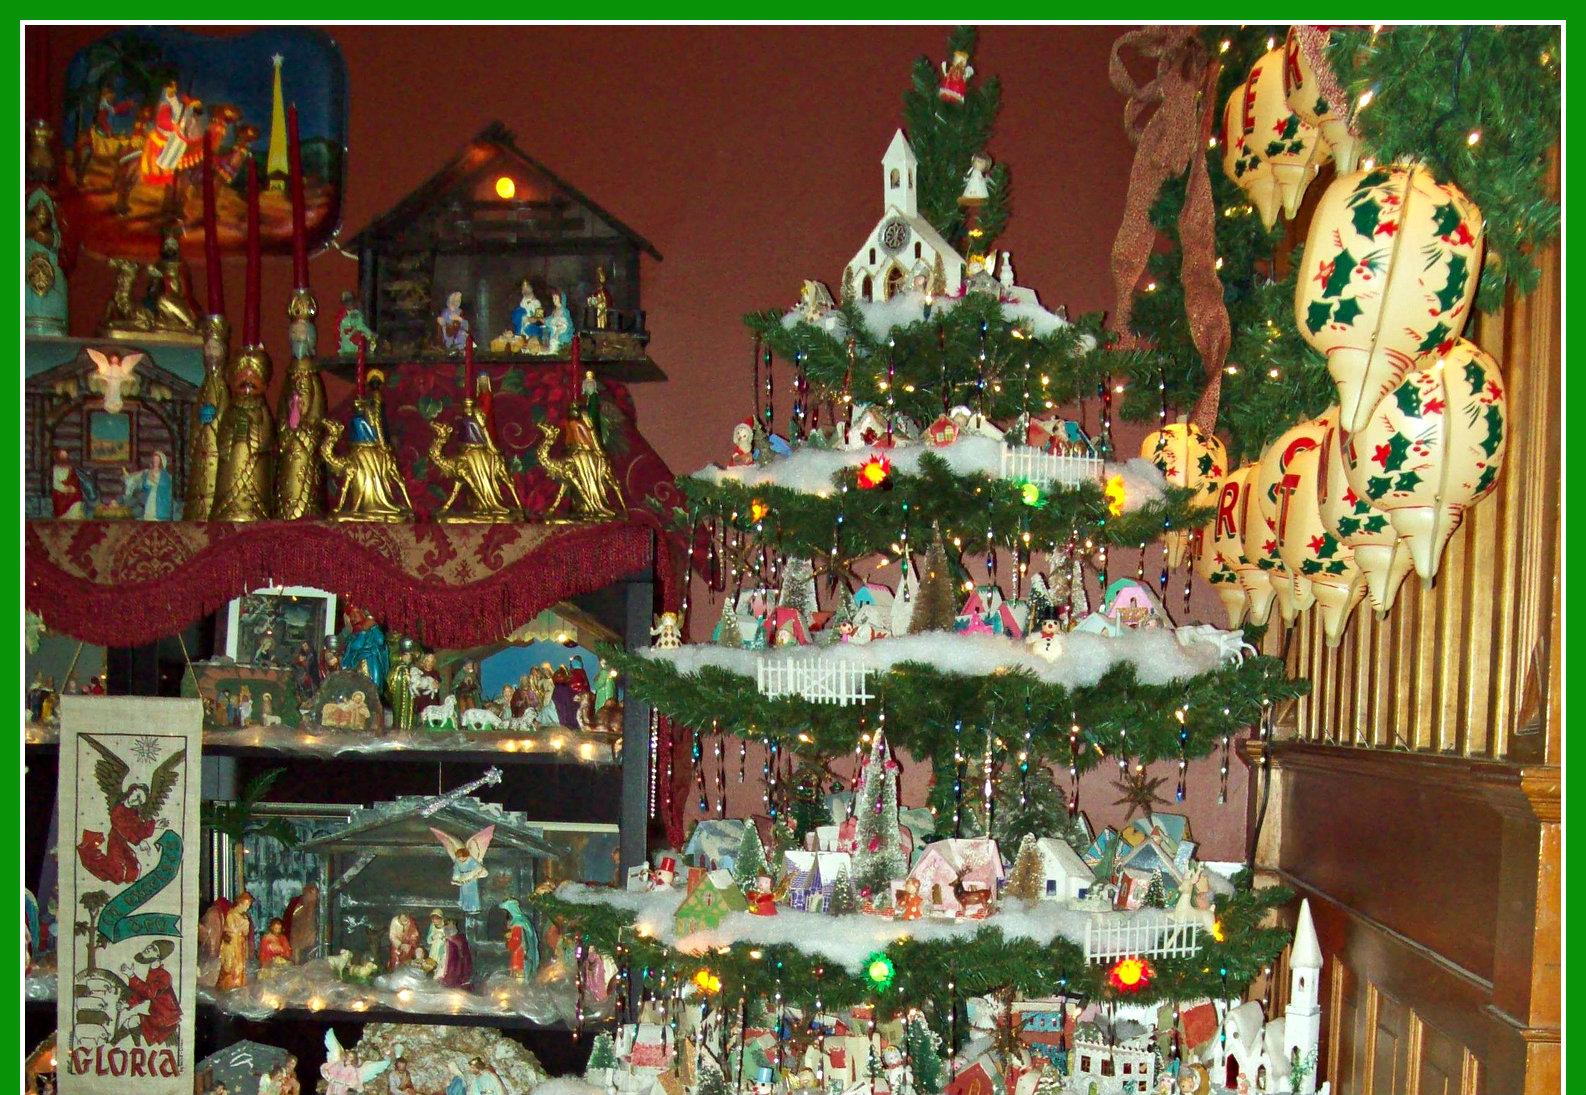 EverythingCroton: THE ULTIMATE CHRISTMAS TREE PUTZ: SCOTTY